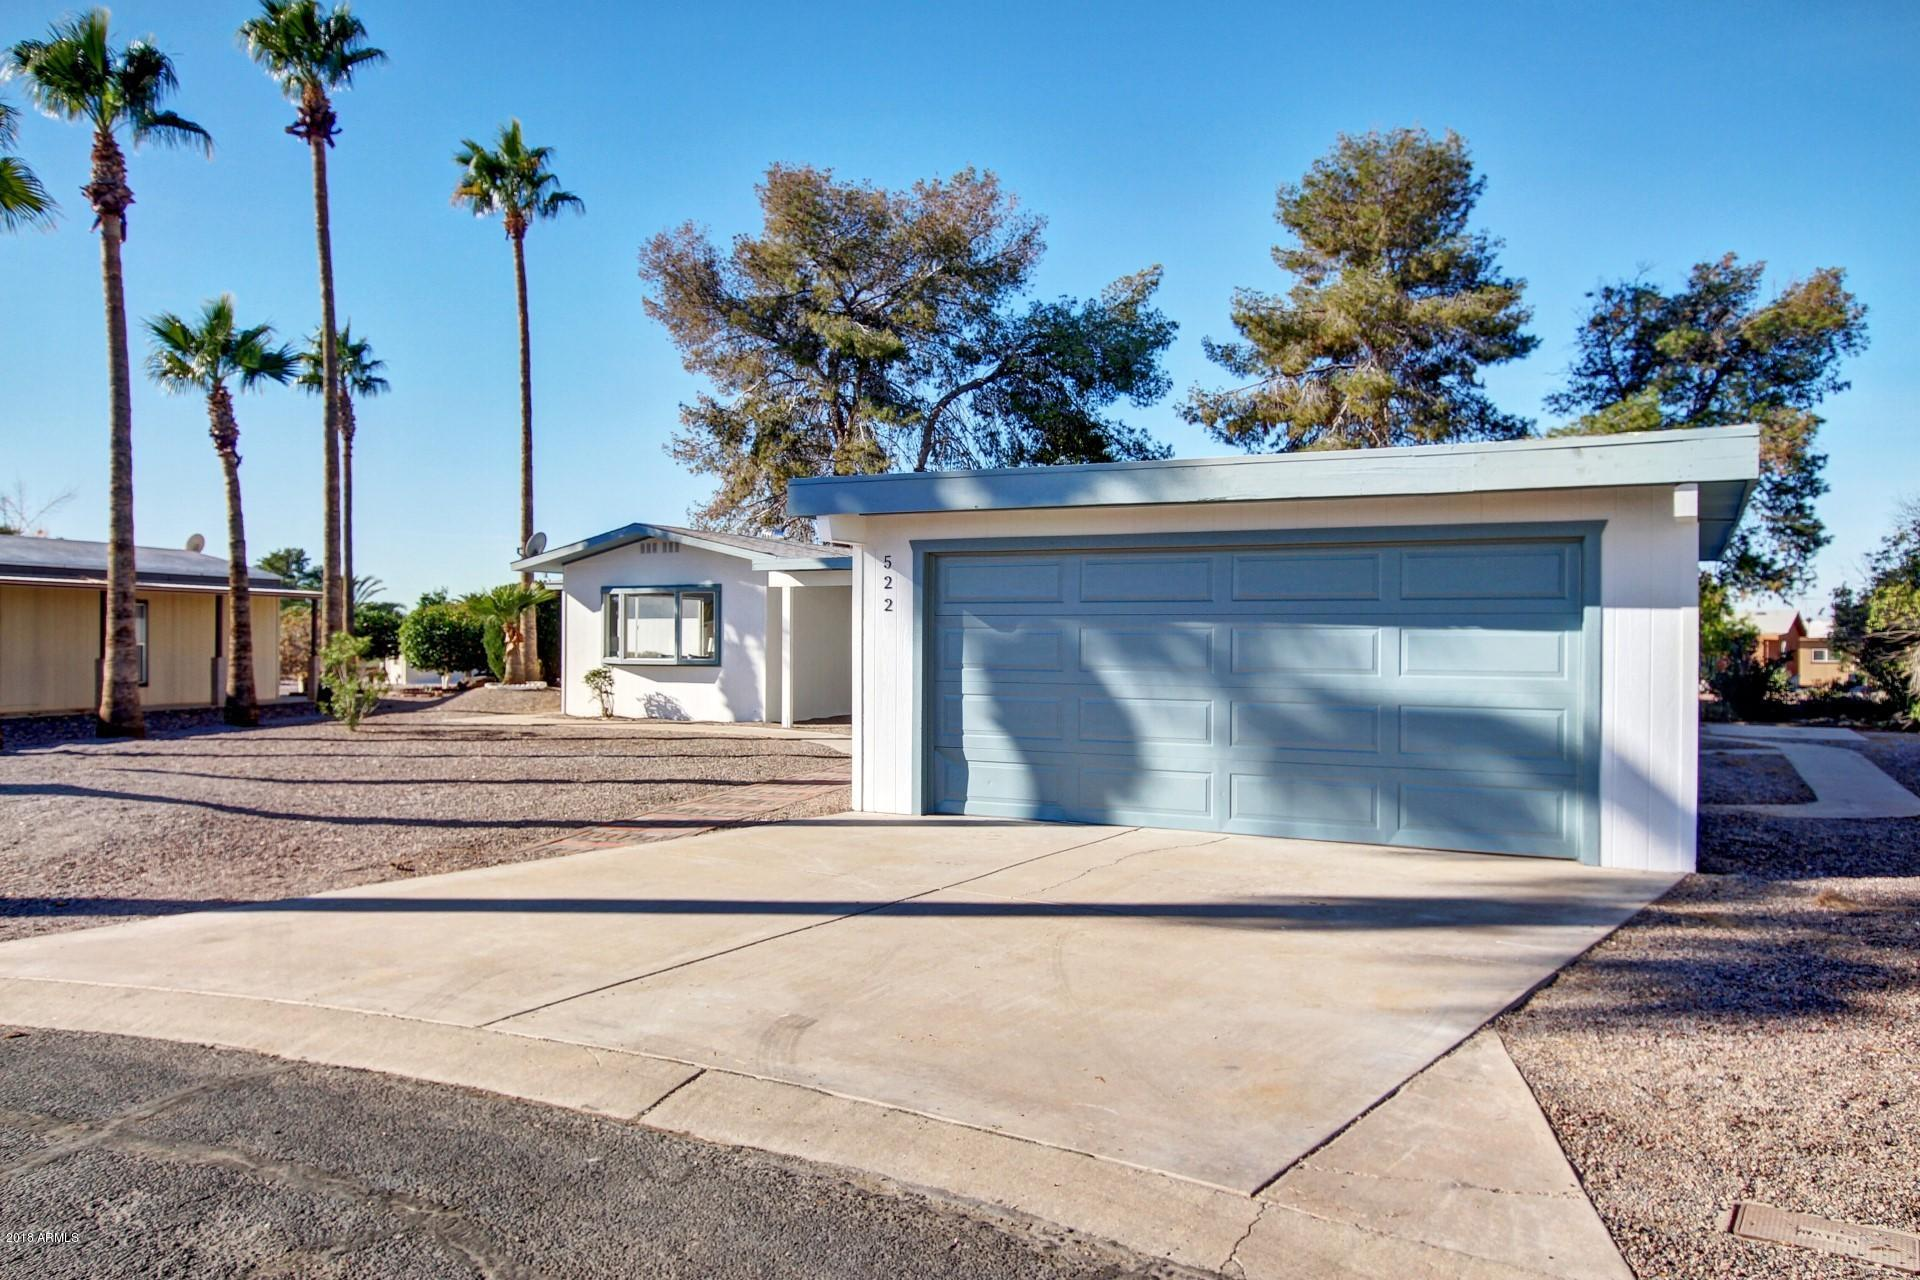 Photo of 522 S 83rd Way, Mesa, AZ 85208